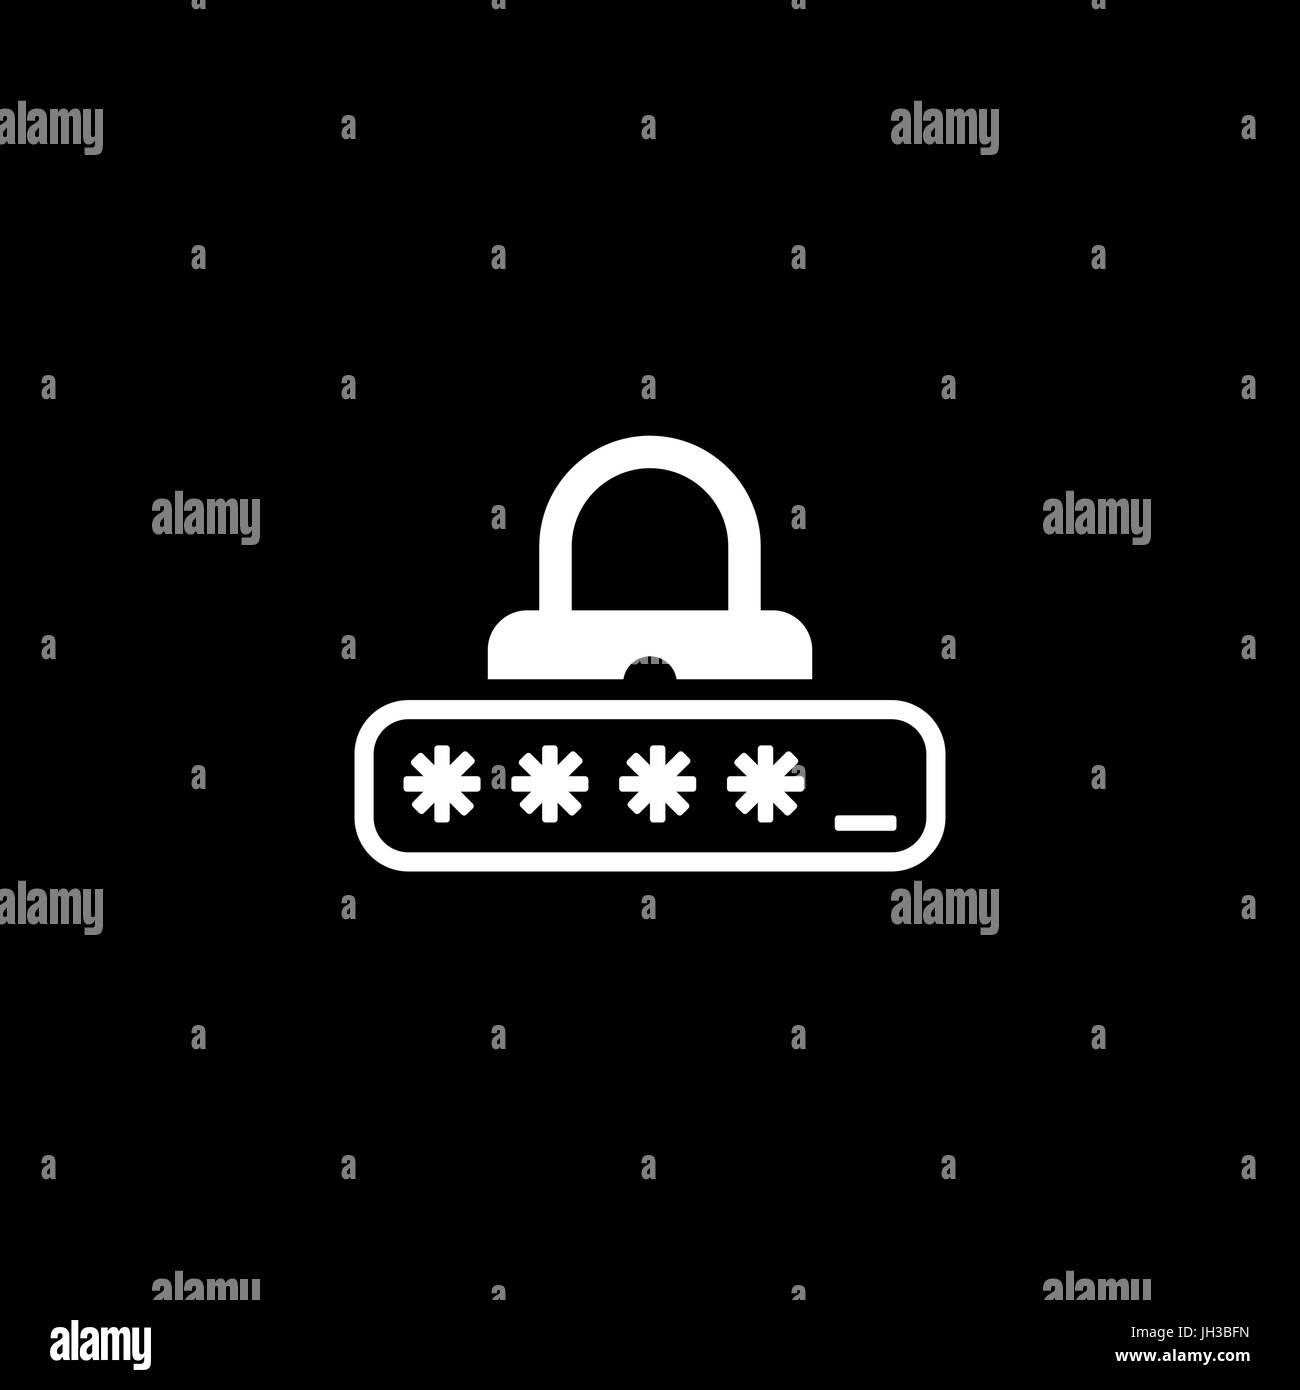 Password Protection Icon. Flat Design. - Stock Image